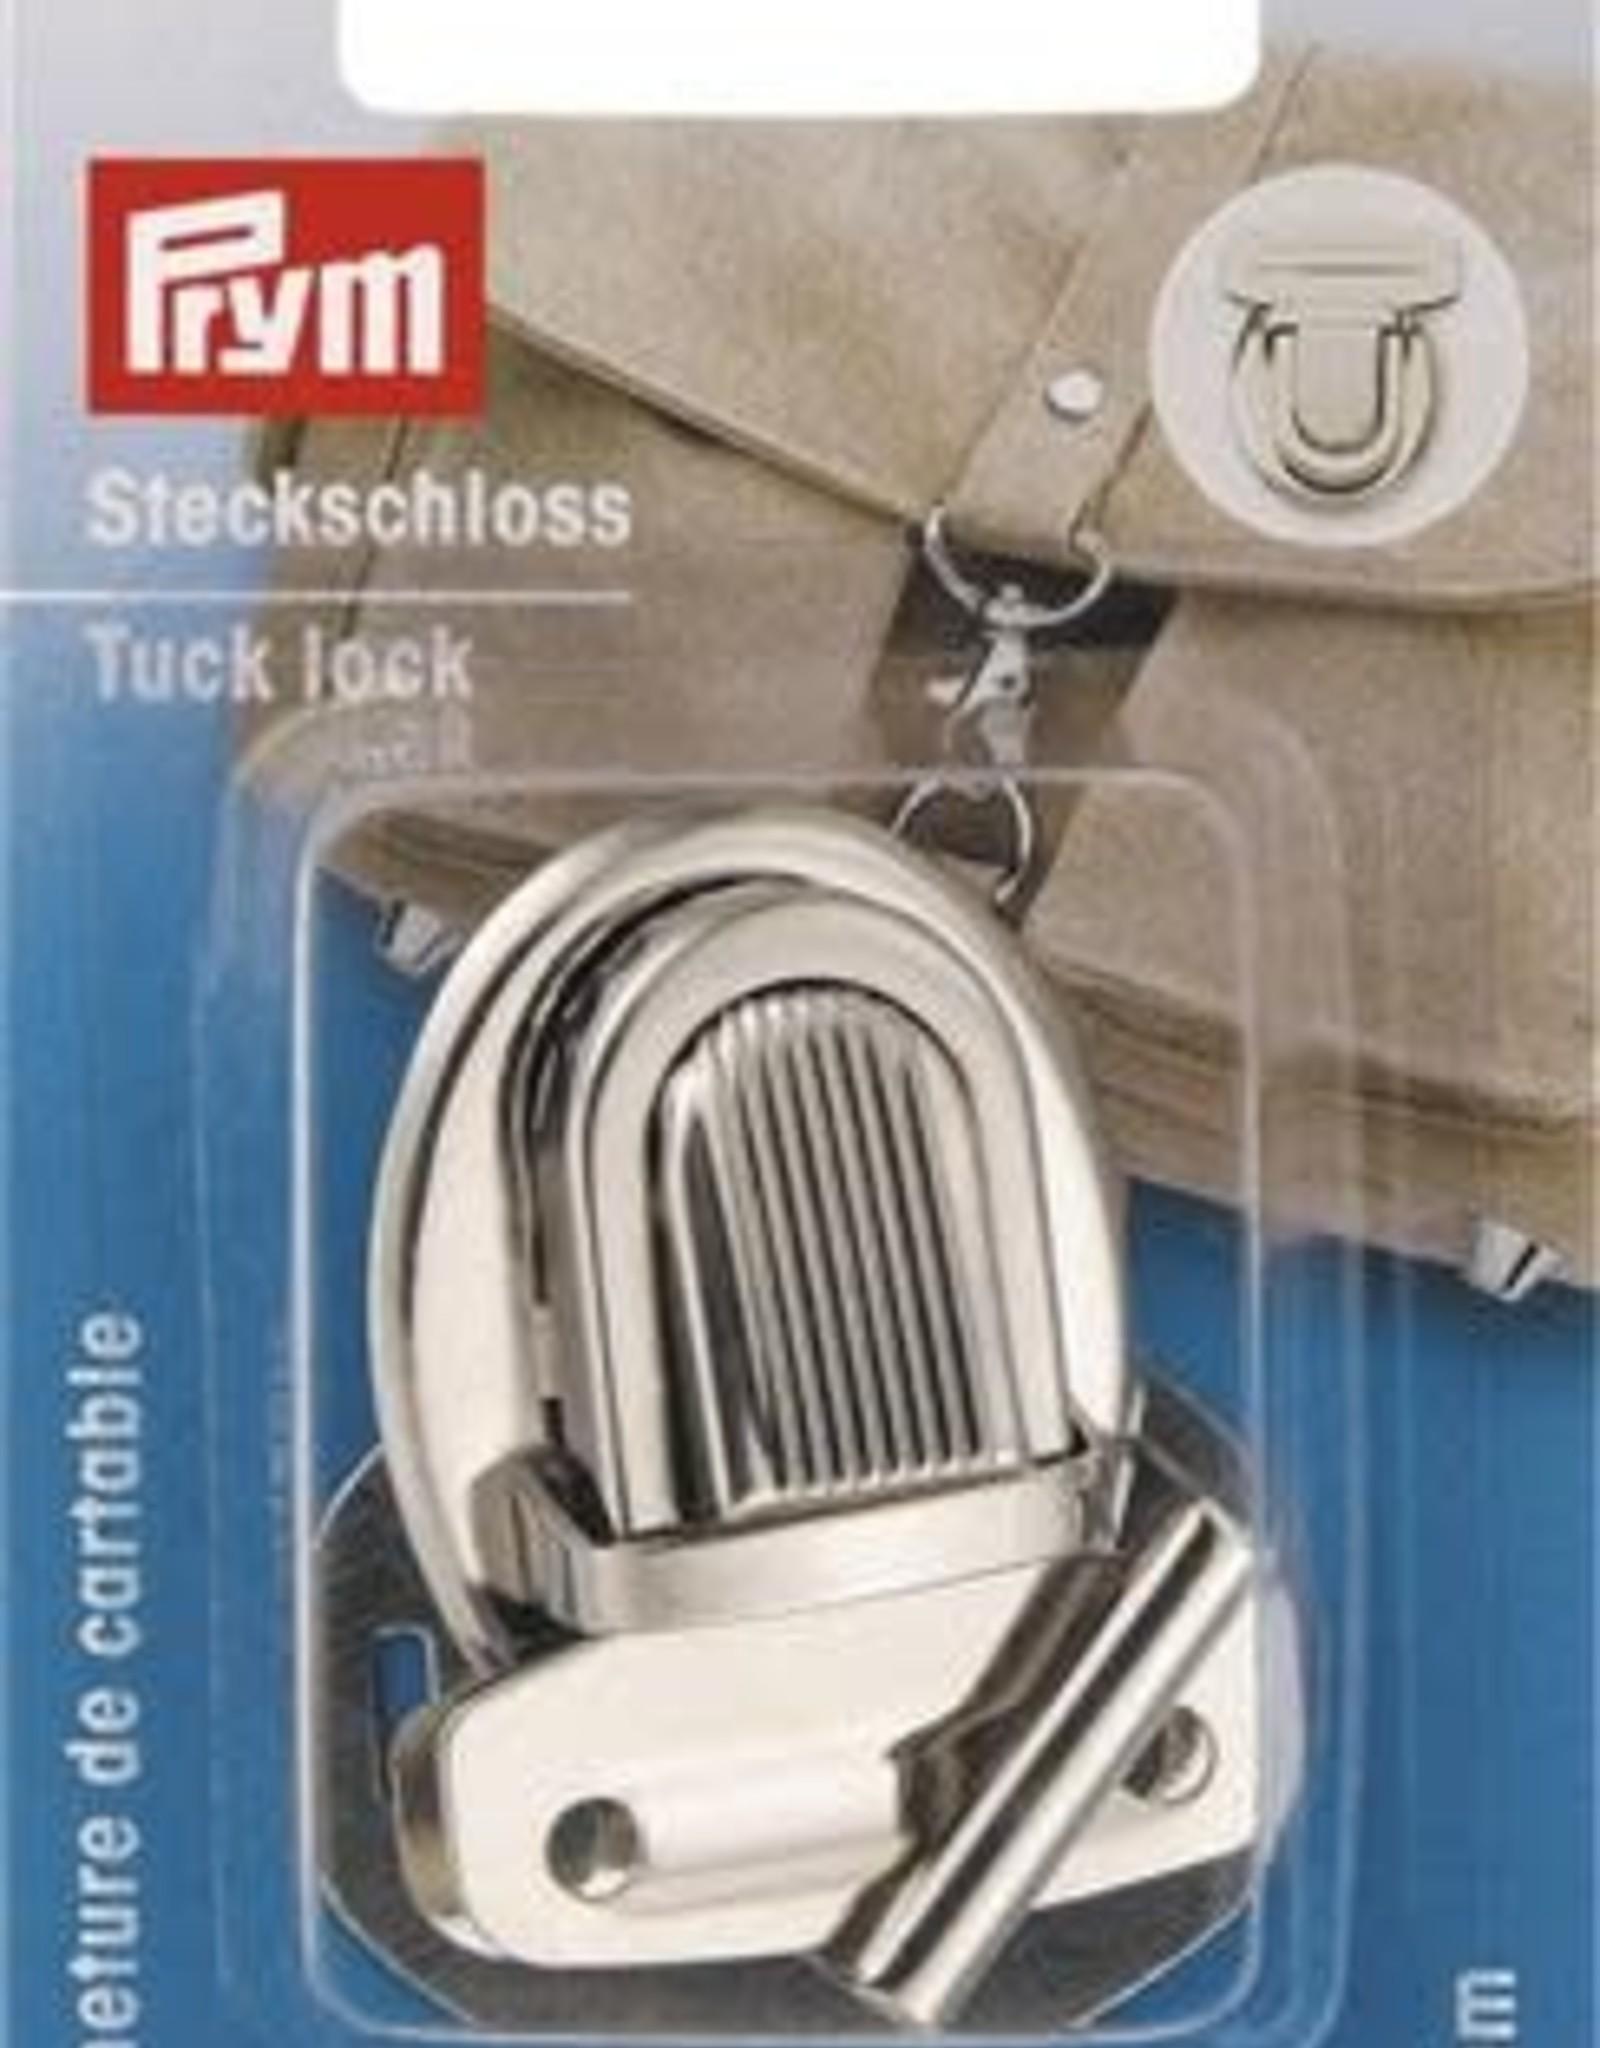 Prym Prym TT-SLOT 26mm ZILVER (1 st)